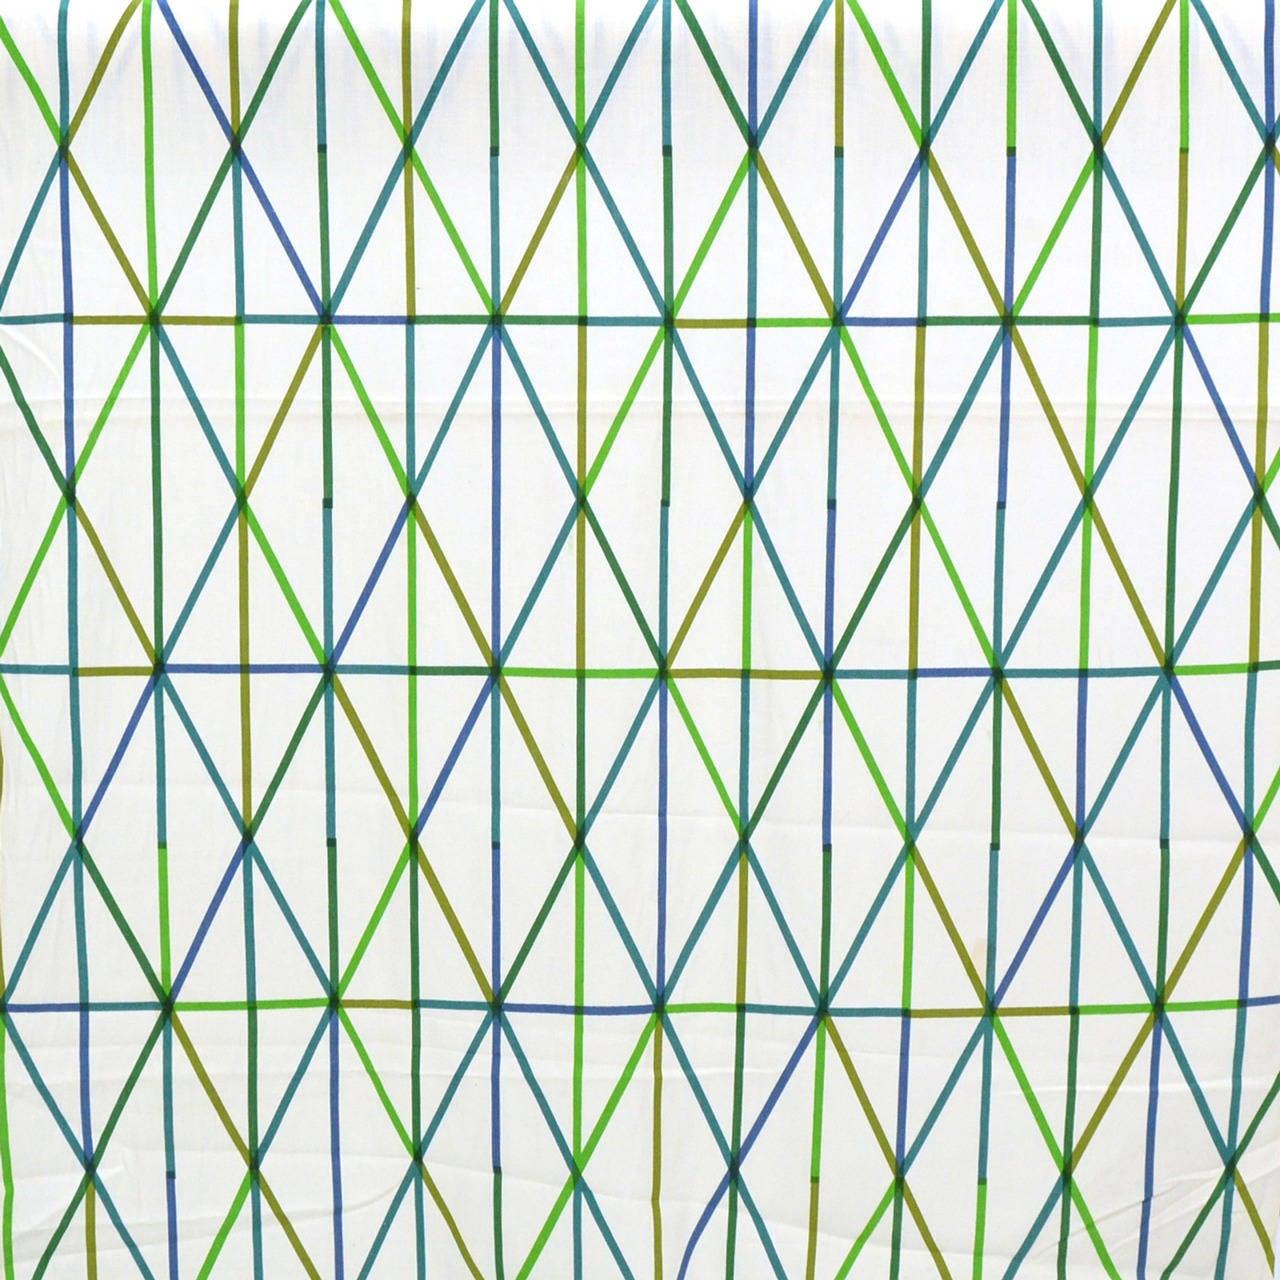 Alexander Girard Rare Quot Grid Quot Fabric At 1stdibs